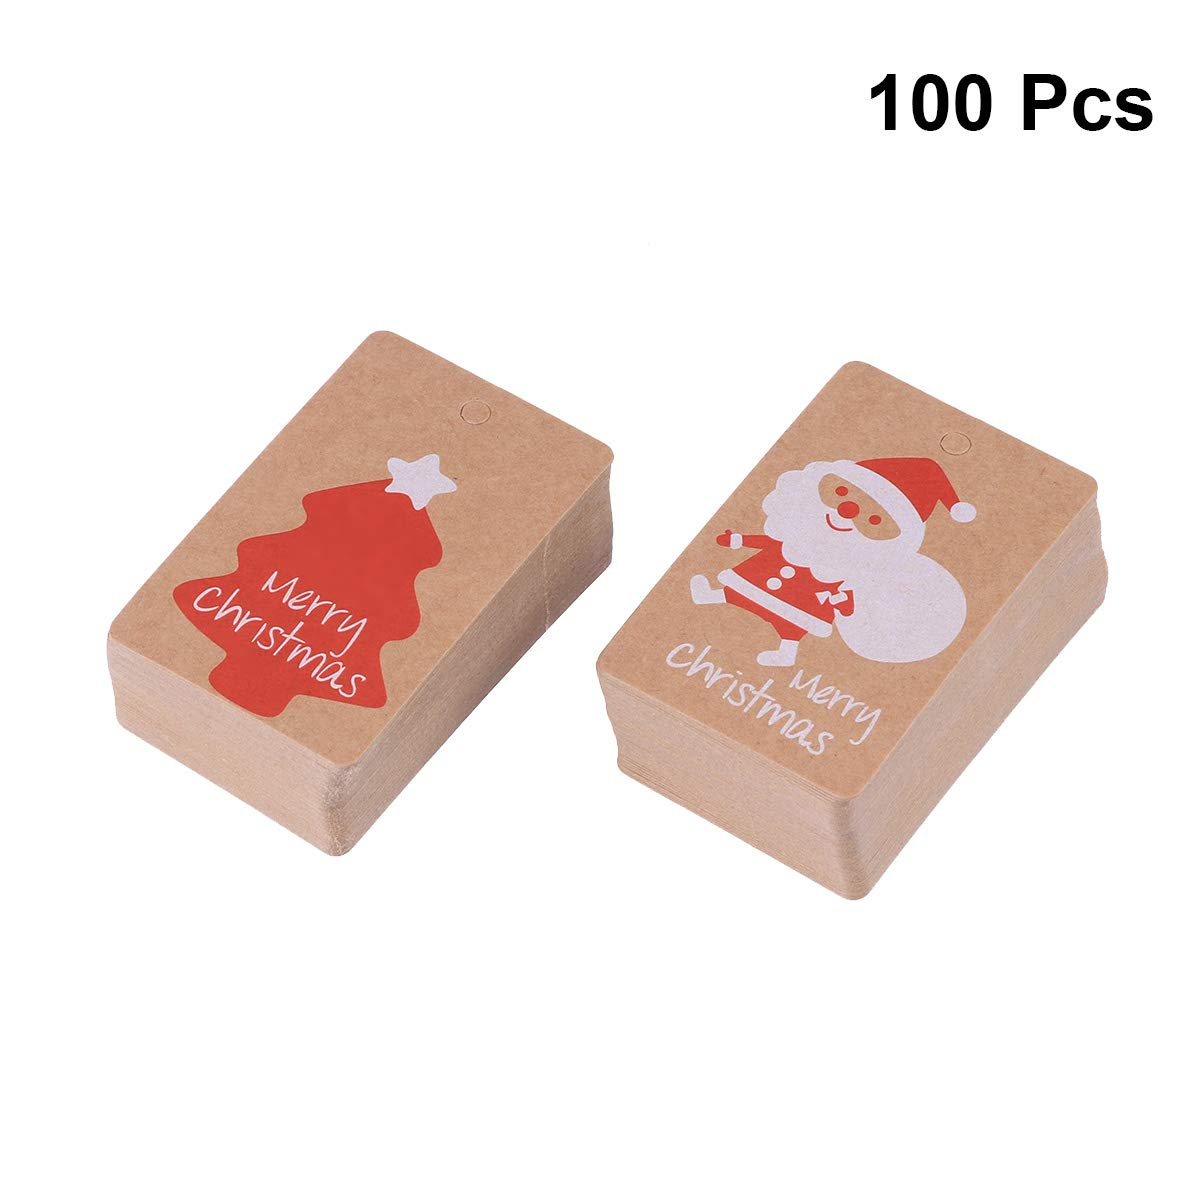 BESTOYARD 100pcs Tag di Carta di Natale Tag Favore Tag Regalo Tabella Nome Tag segnaposto Vuoto Natale Hang Tag colorato Iuta Carta Kraft Tag Senza Corda